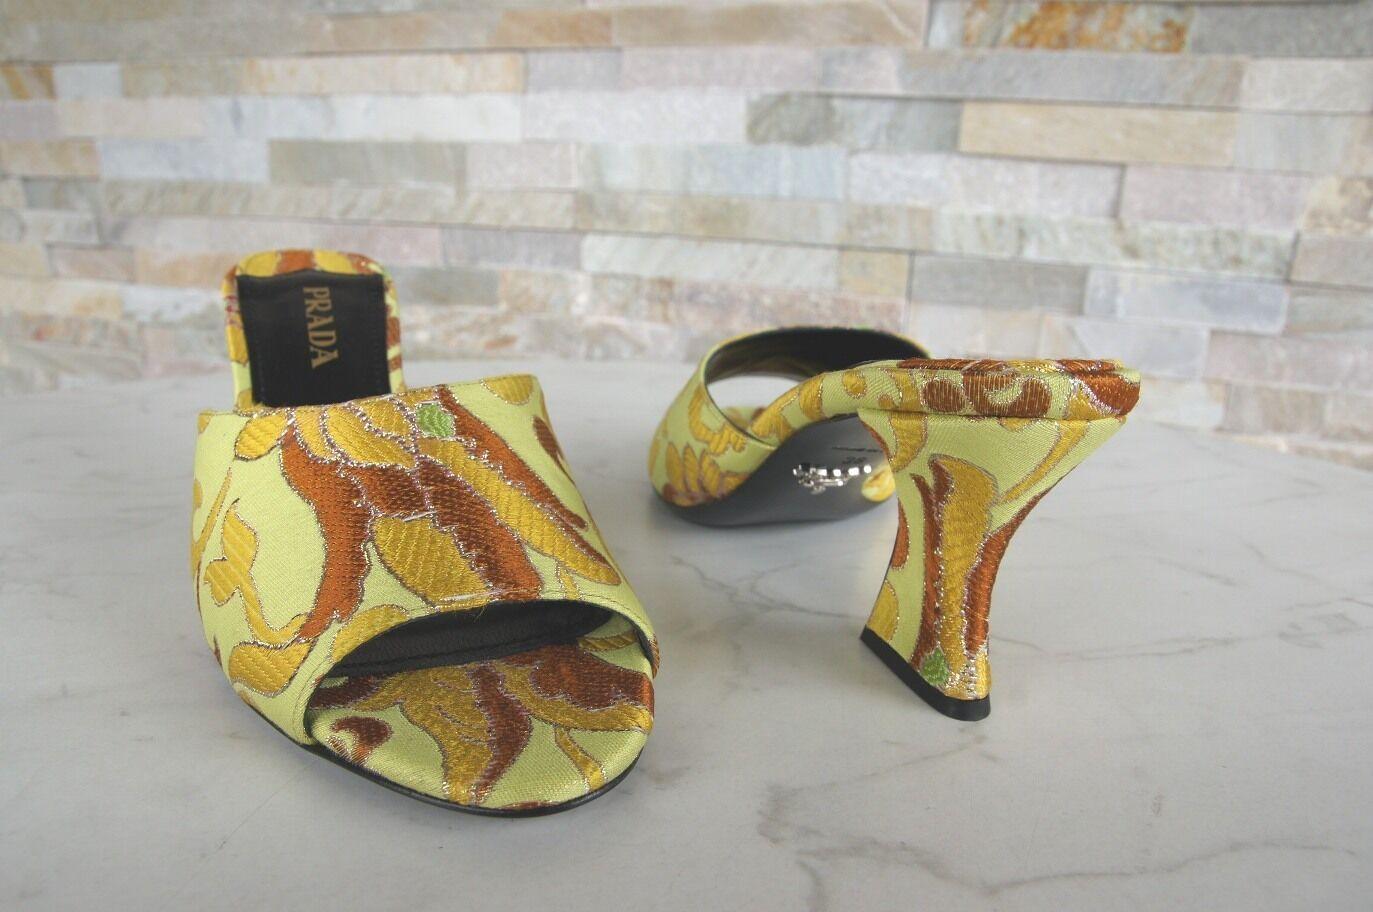 PRADA PRADA PRADA Gr 36,5 Pantoletten Sandaletten Sandalen Schuhe Lime Limone NEU a6a954